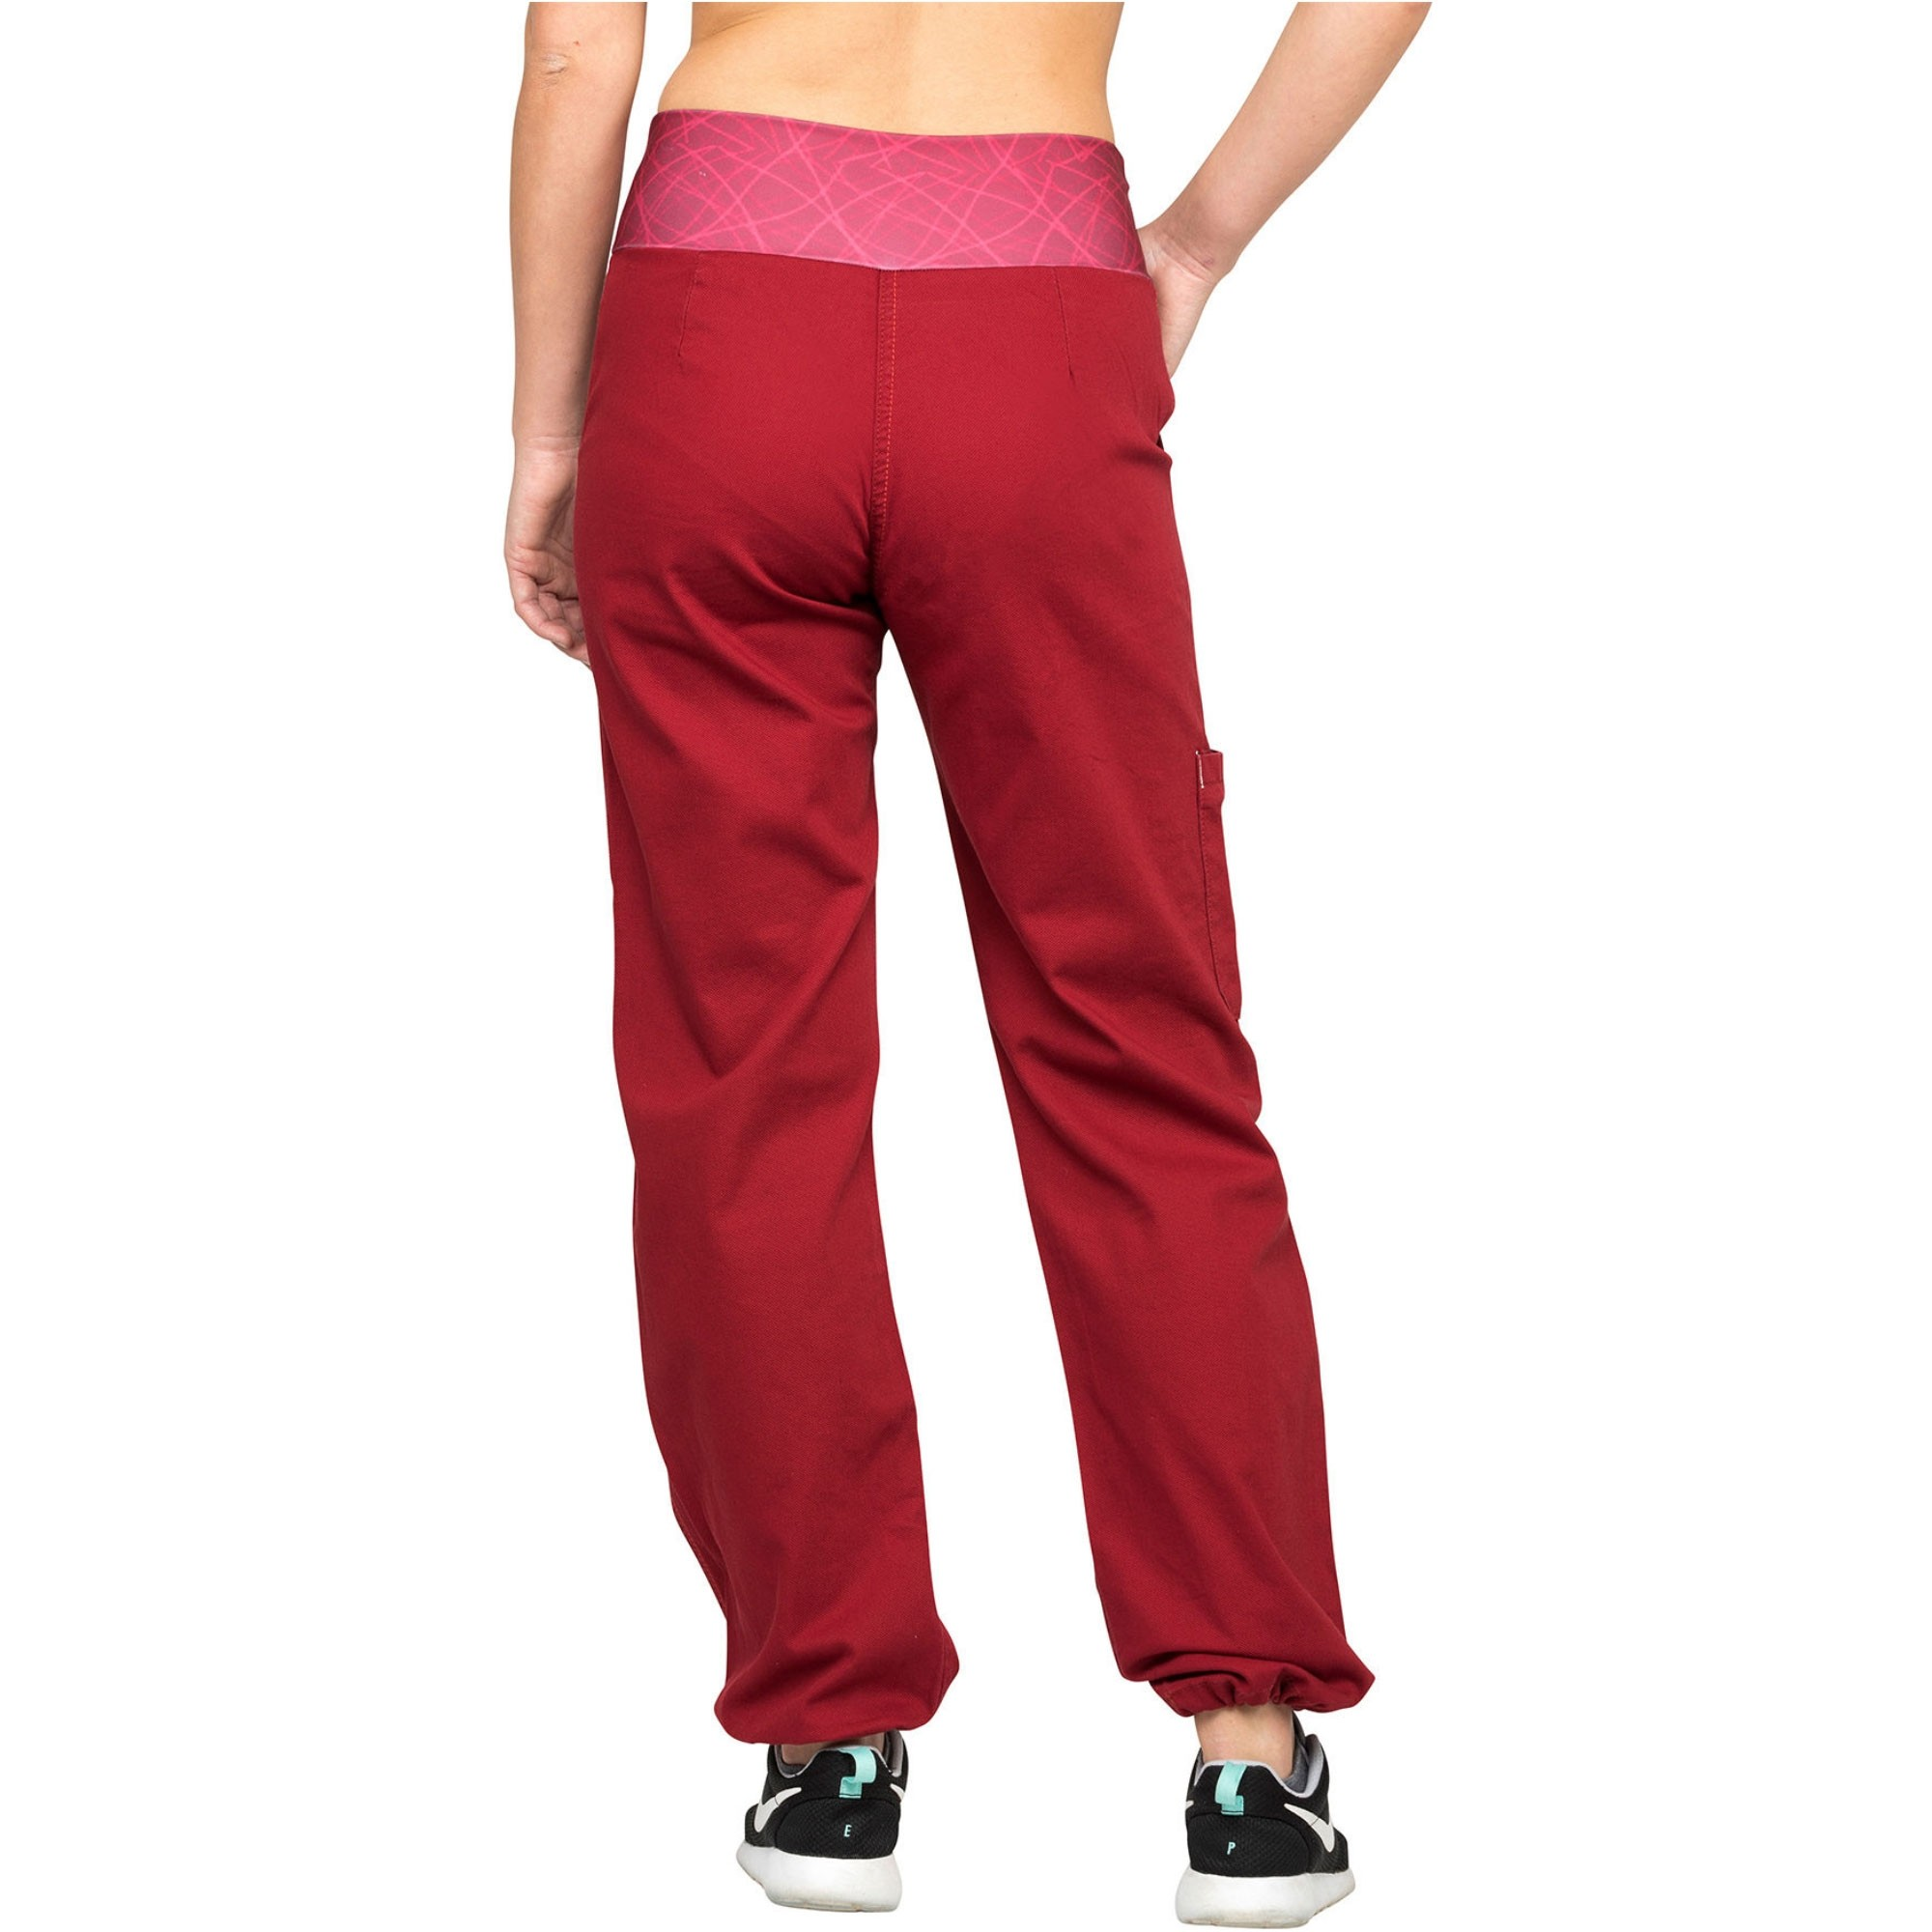 Chillaz-Sandra-Pant-Red-2-S18